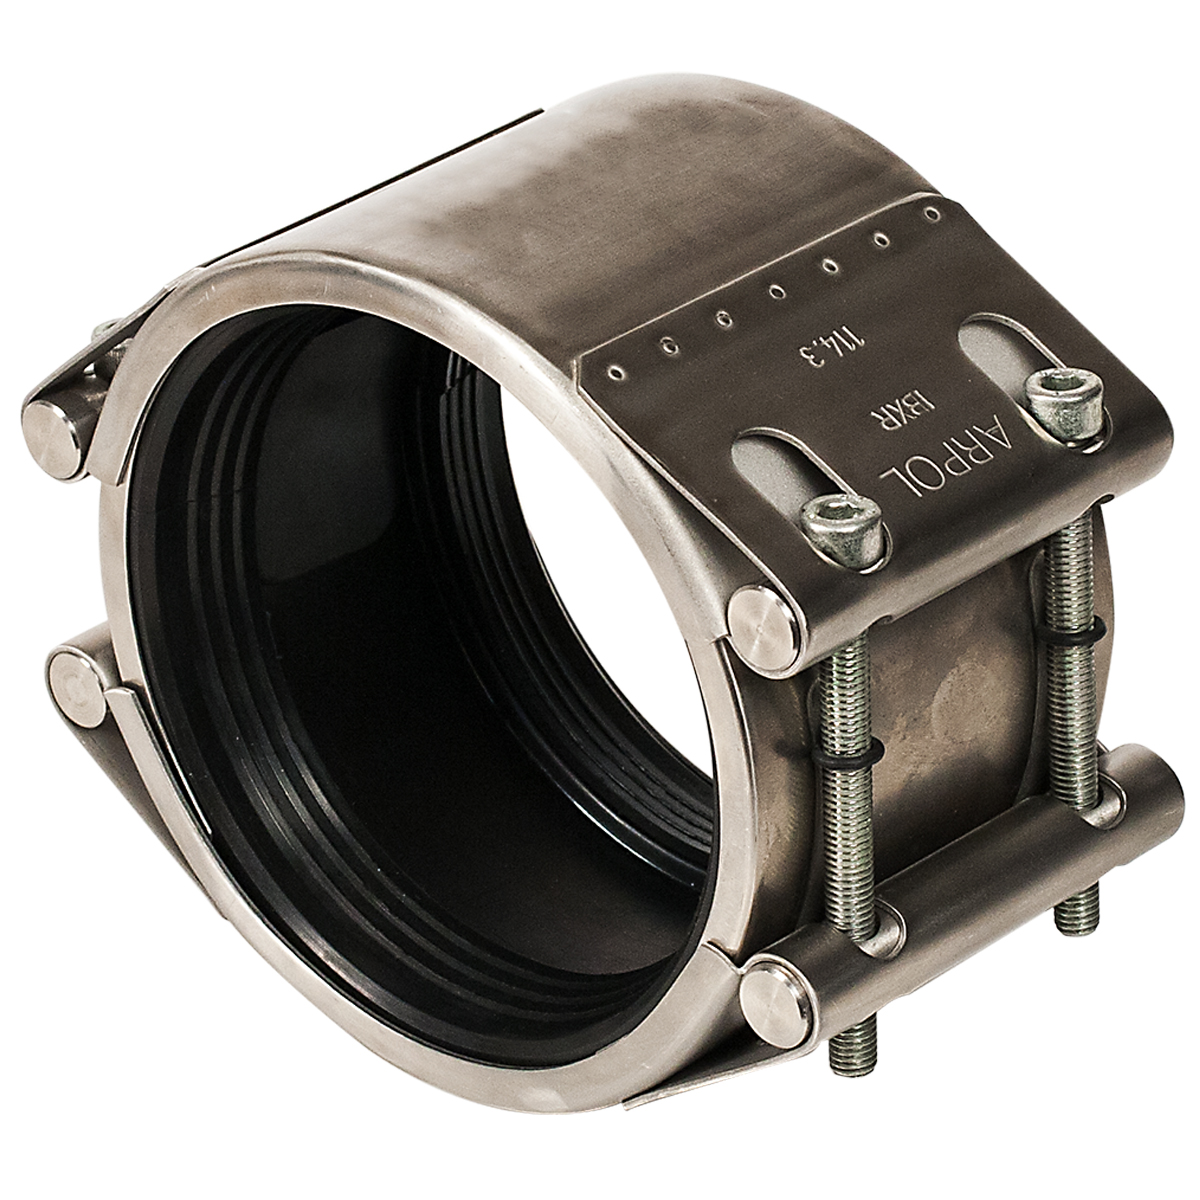 ARMOR SEAL - All stainless steel flexible repair clamp